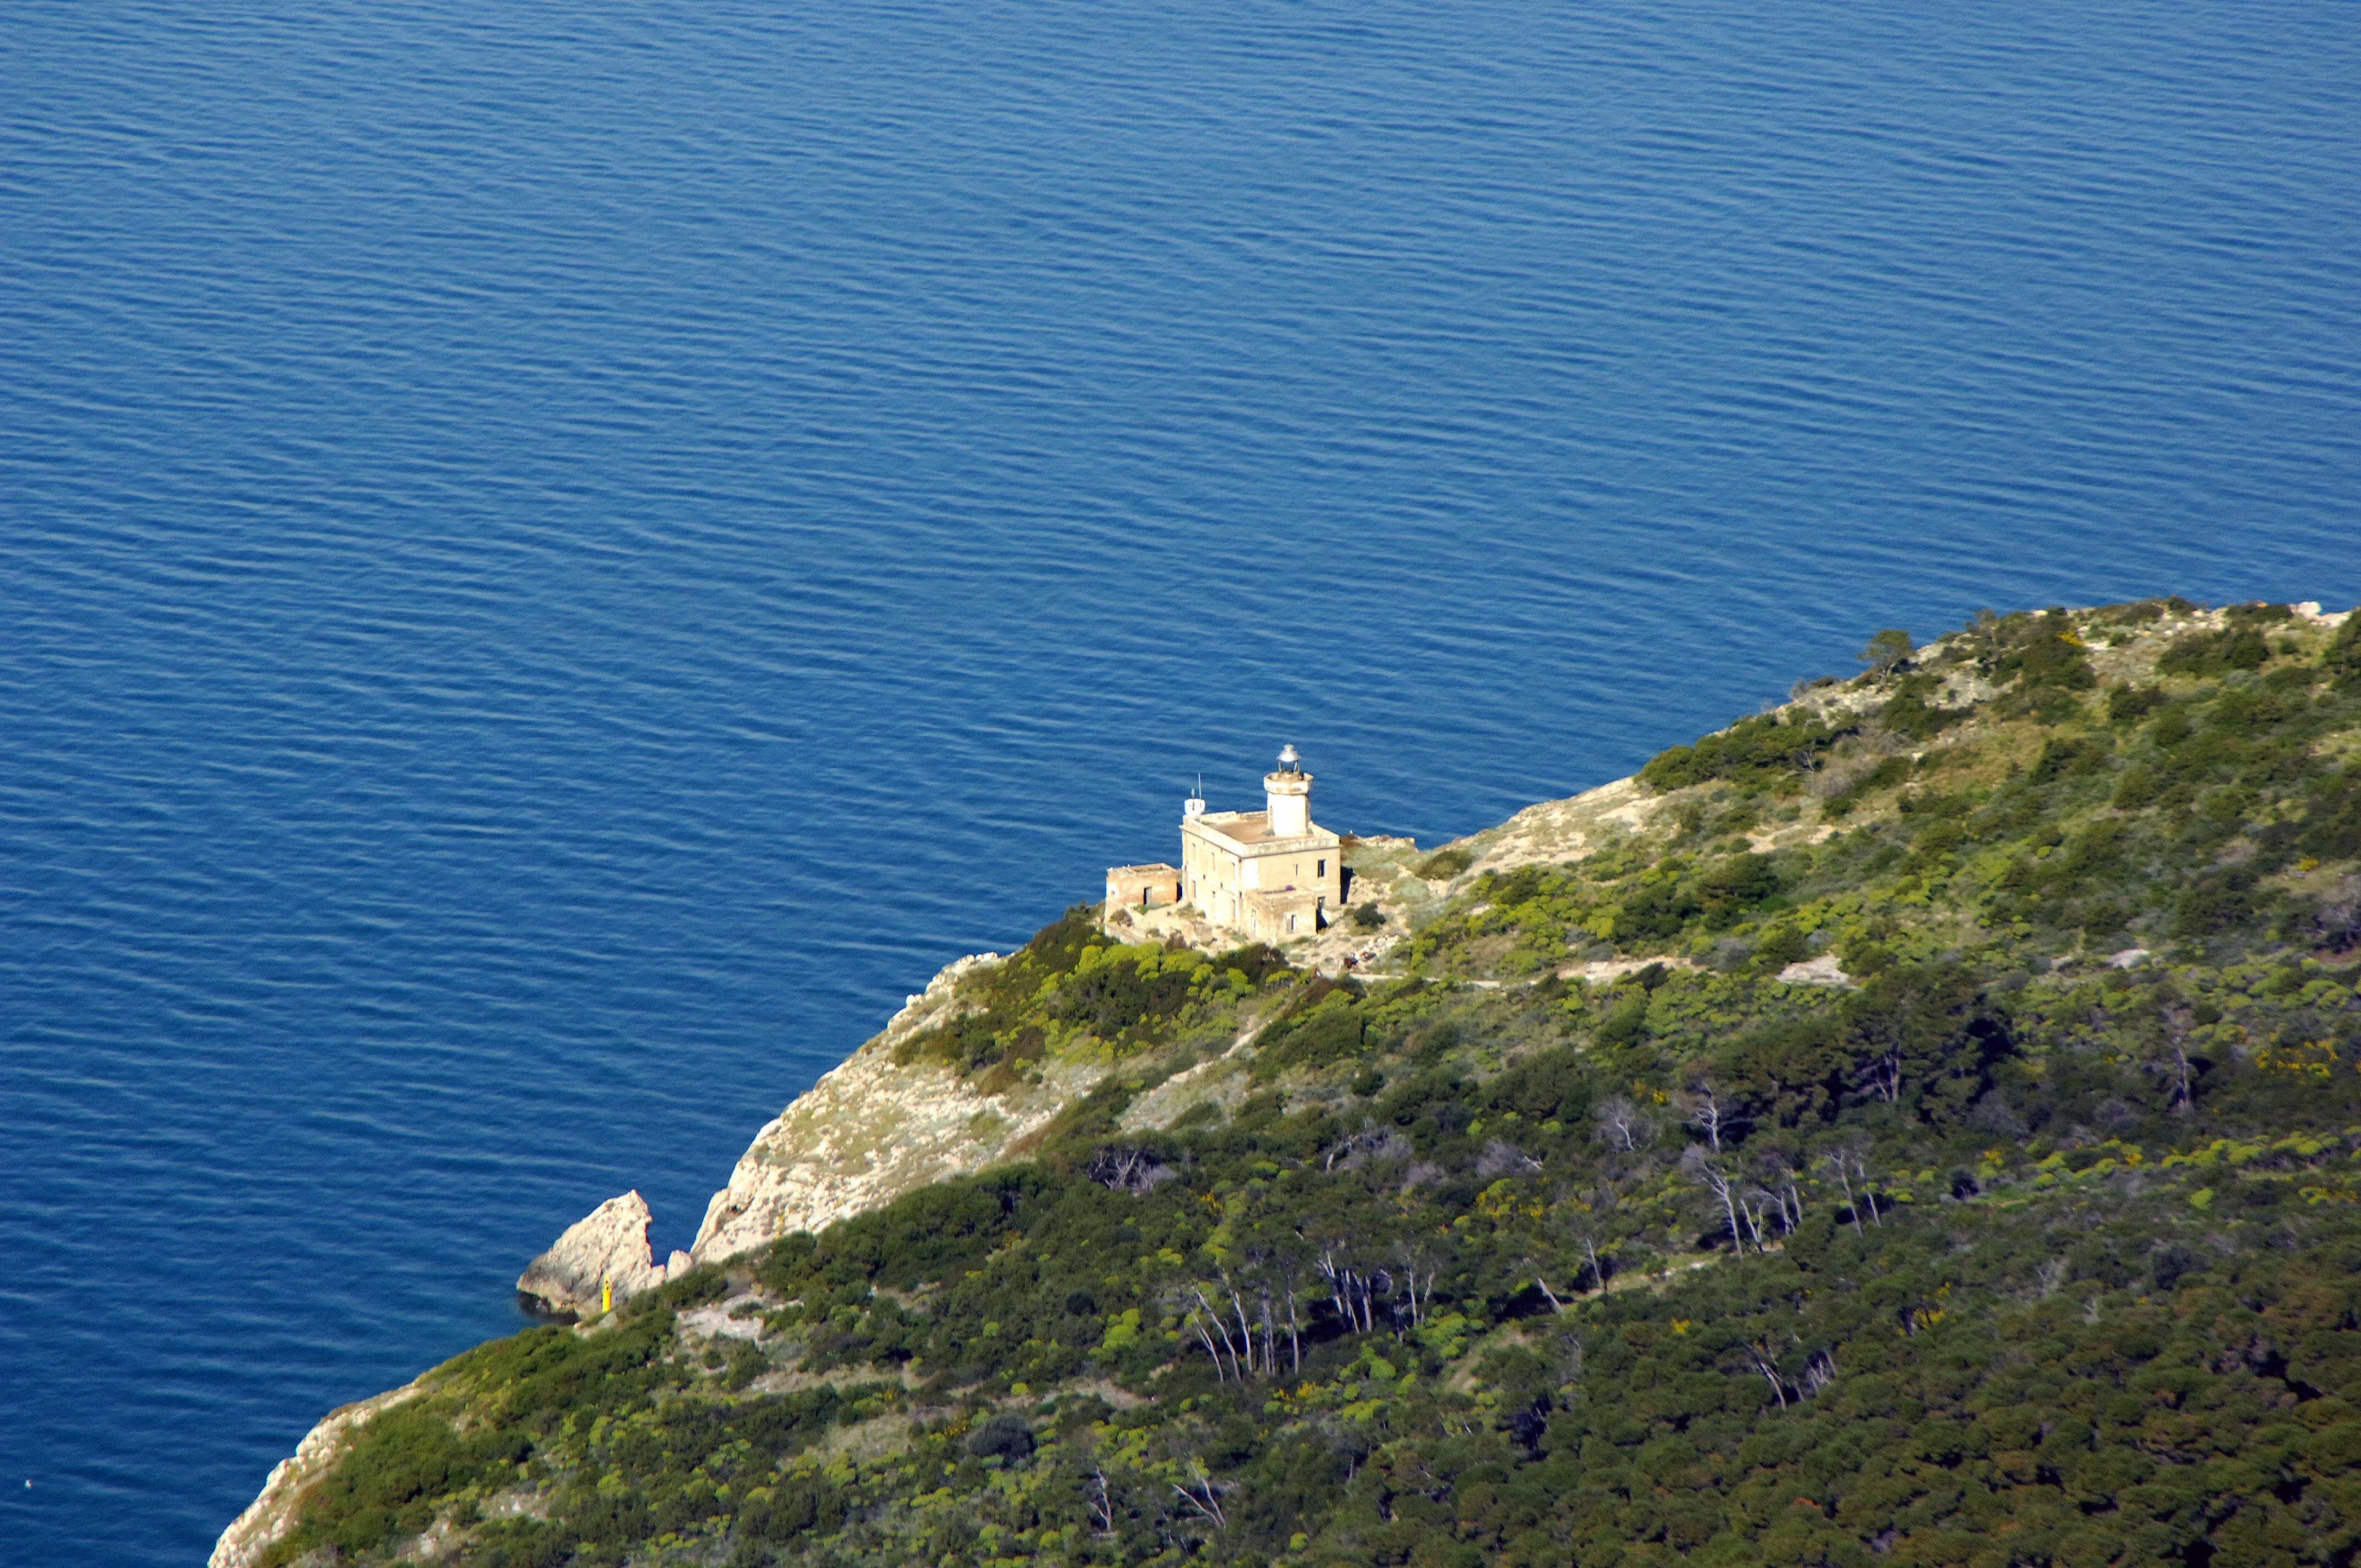 San Domino Light Lighthouse In Isole Tremiti Italy